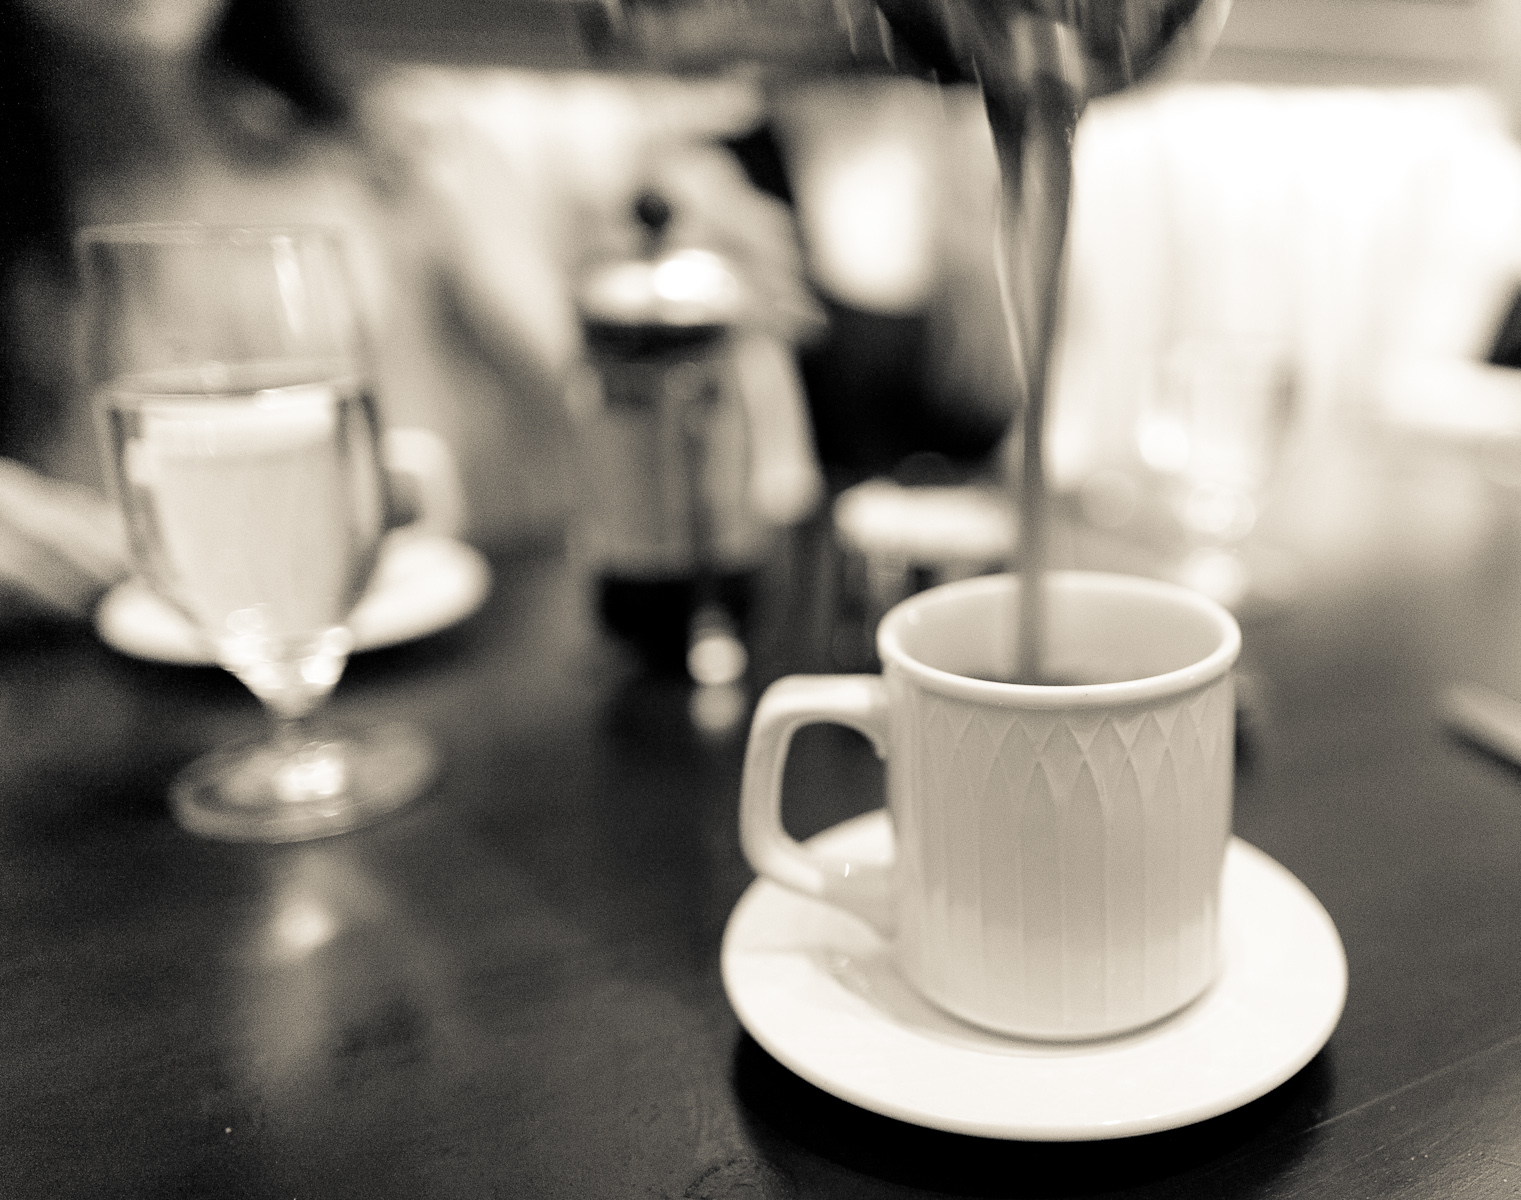 French press Sumatra Mandheling fair trade certified organic decaffeinated coffee ($4.5)